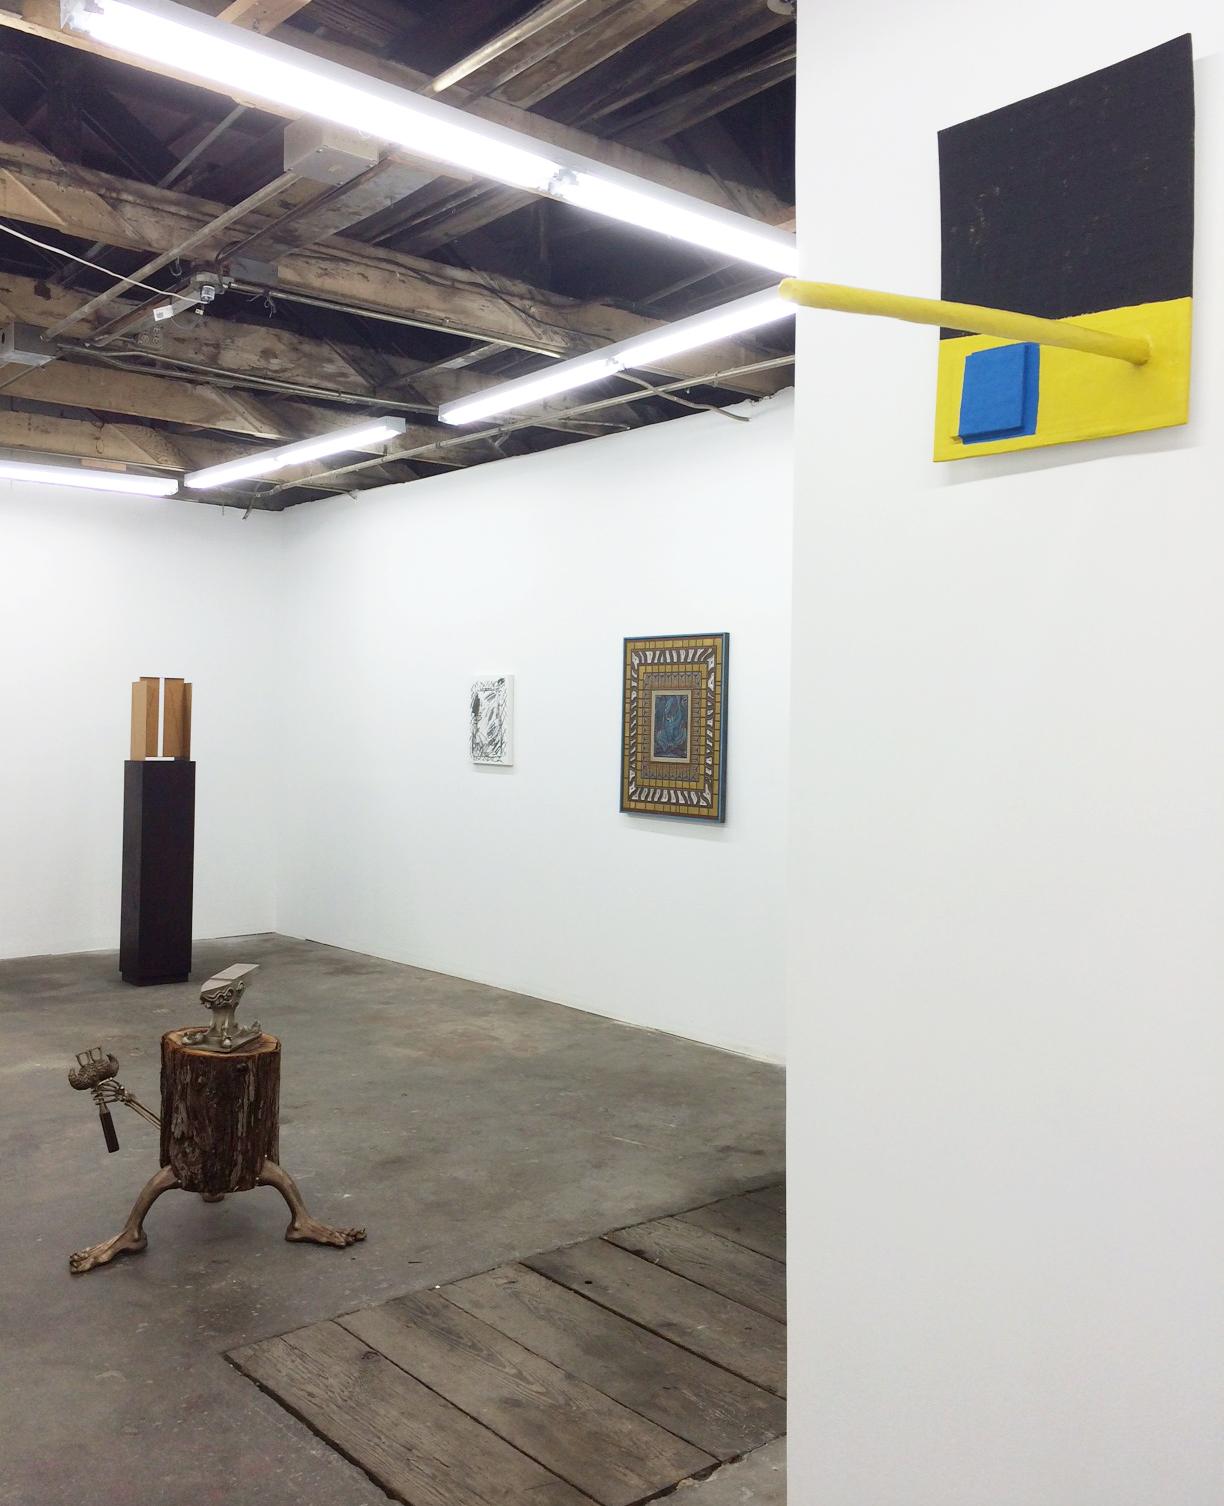 Installation shot Andrew Sexton, Matt Paweski, Laura Owens, Zach Harris and Roy Dowell